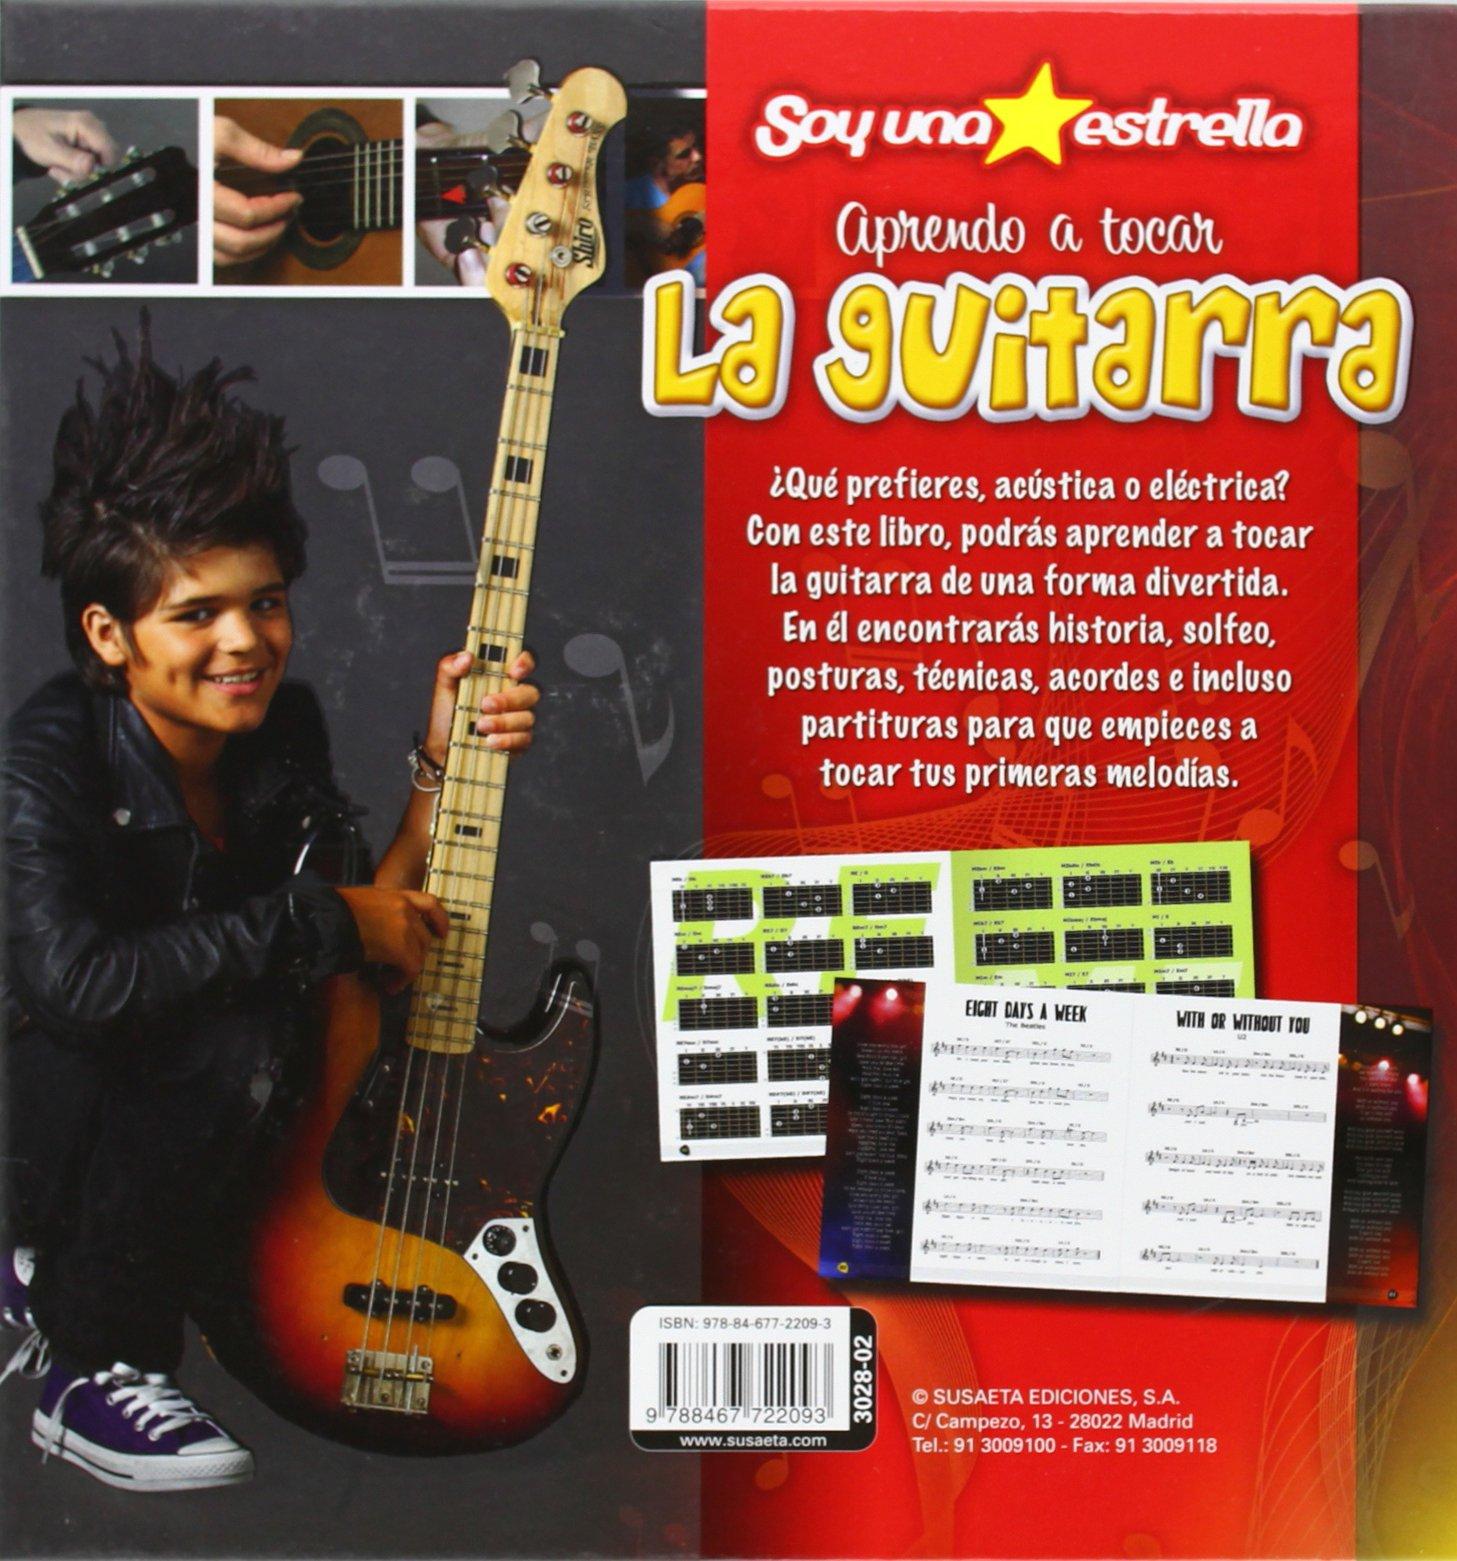 Aprendo a tocar la guitarra: Susaeta Equipo: 9788467722093: Amazon.com: Books